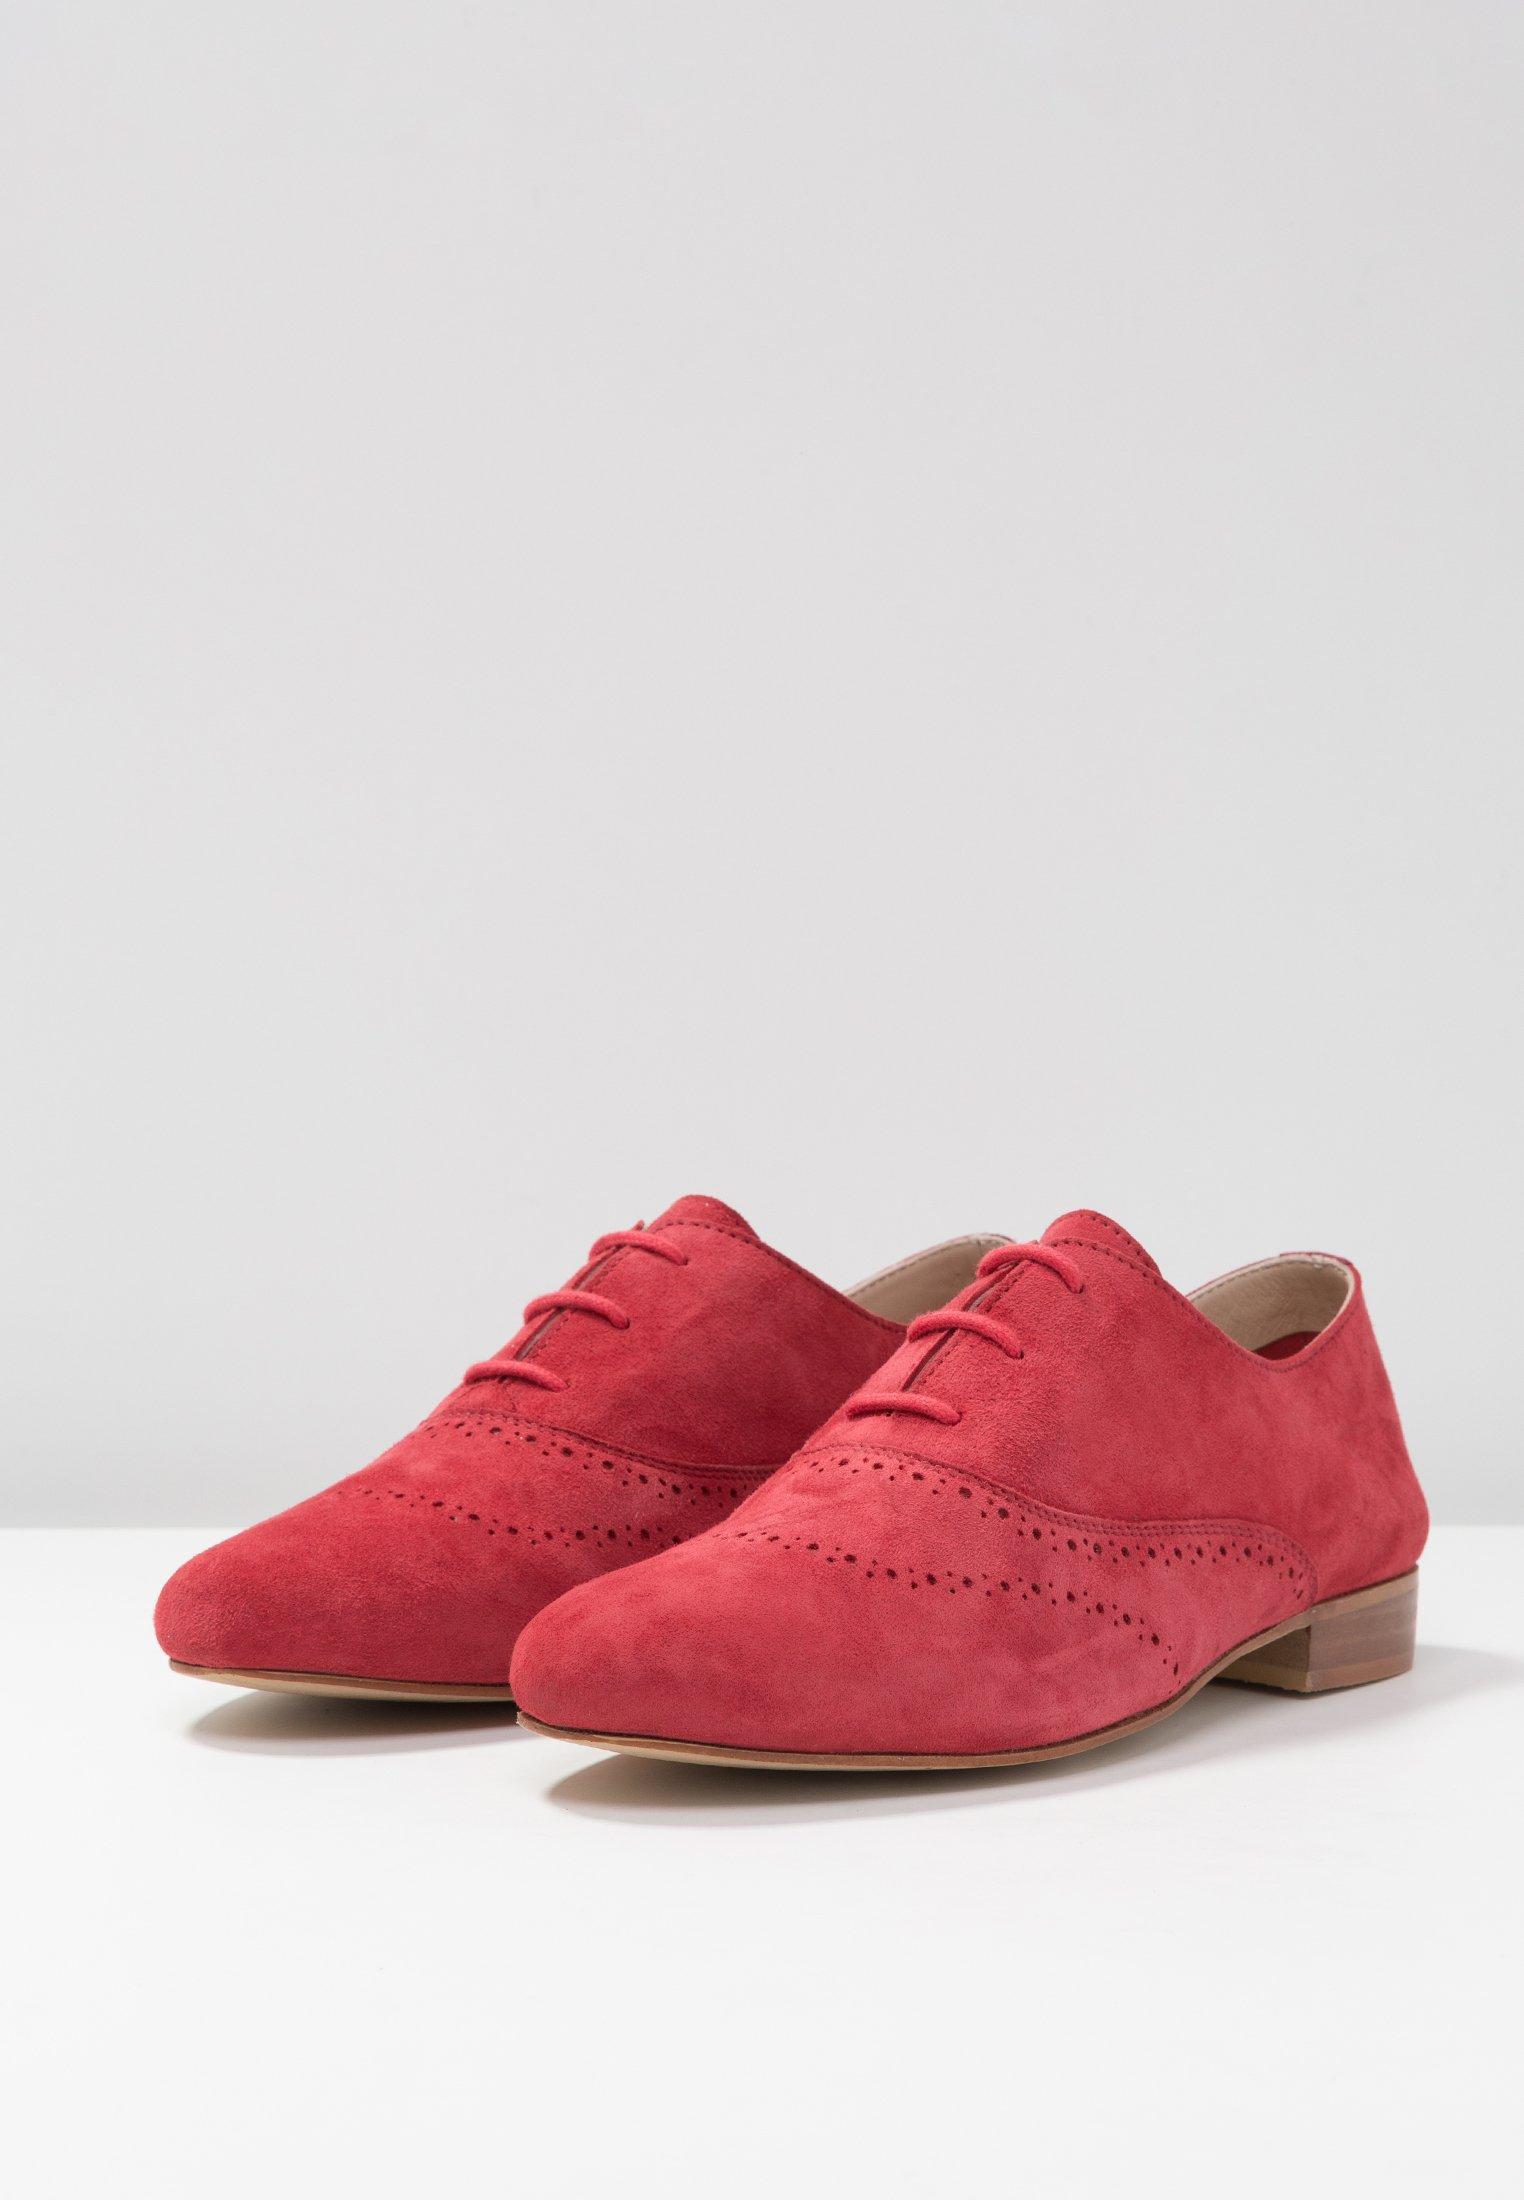 mint&berry Derbies red